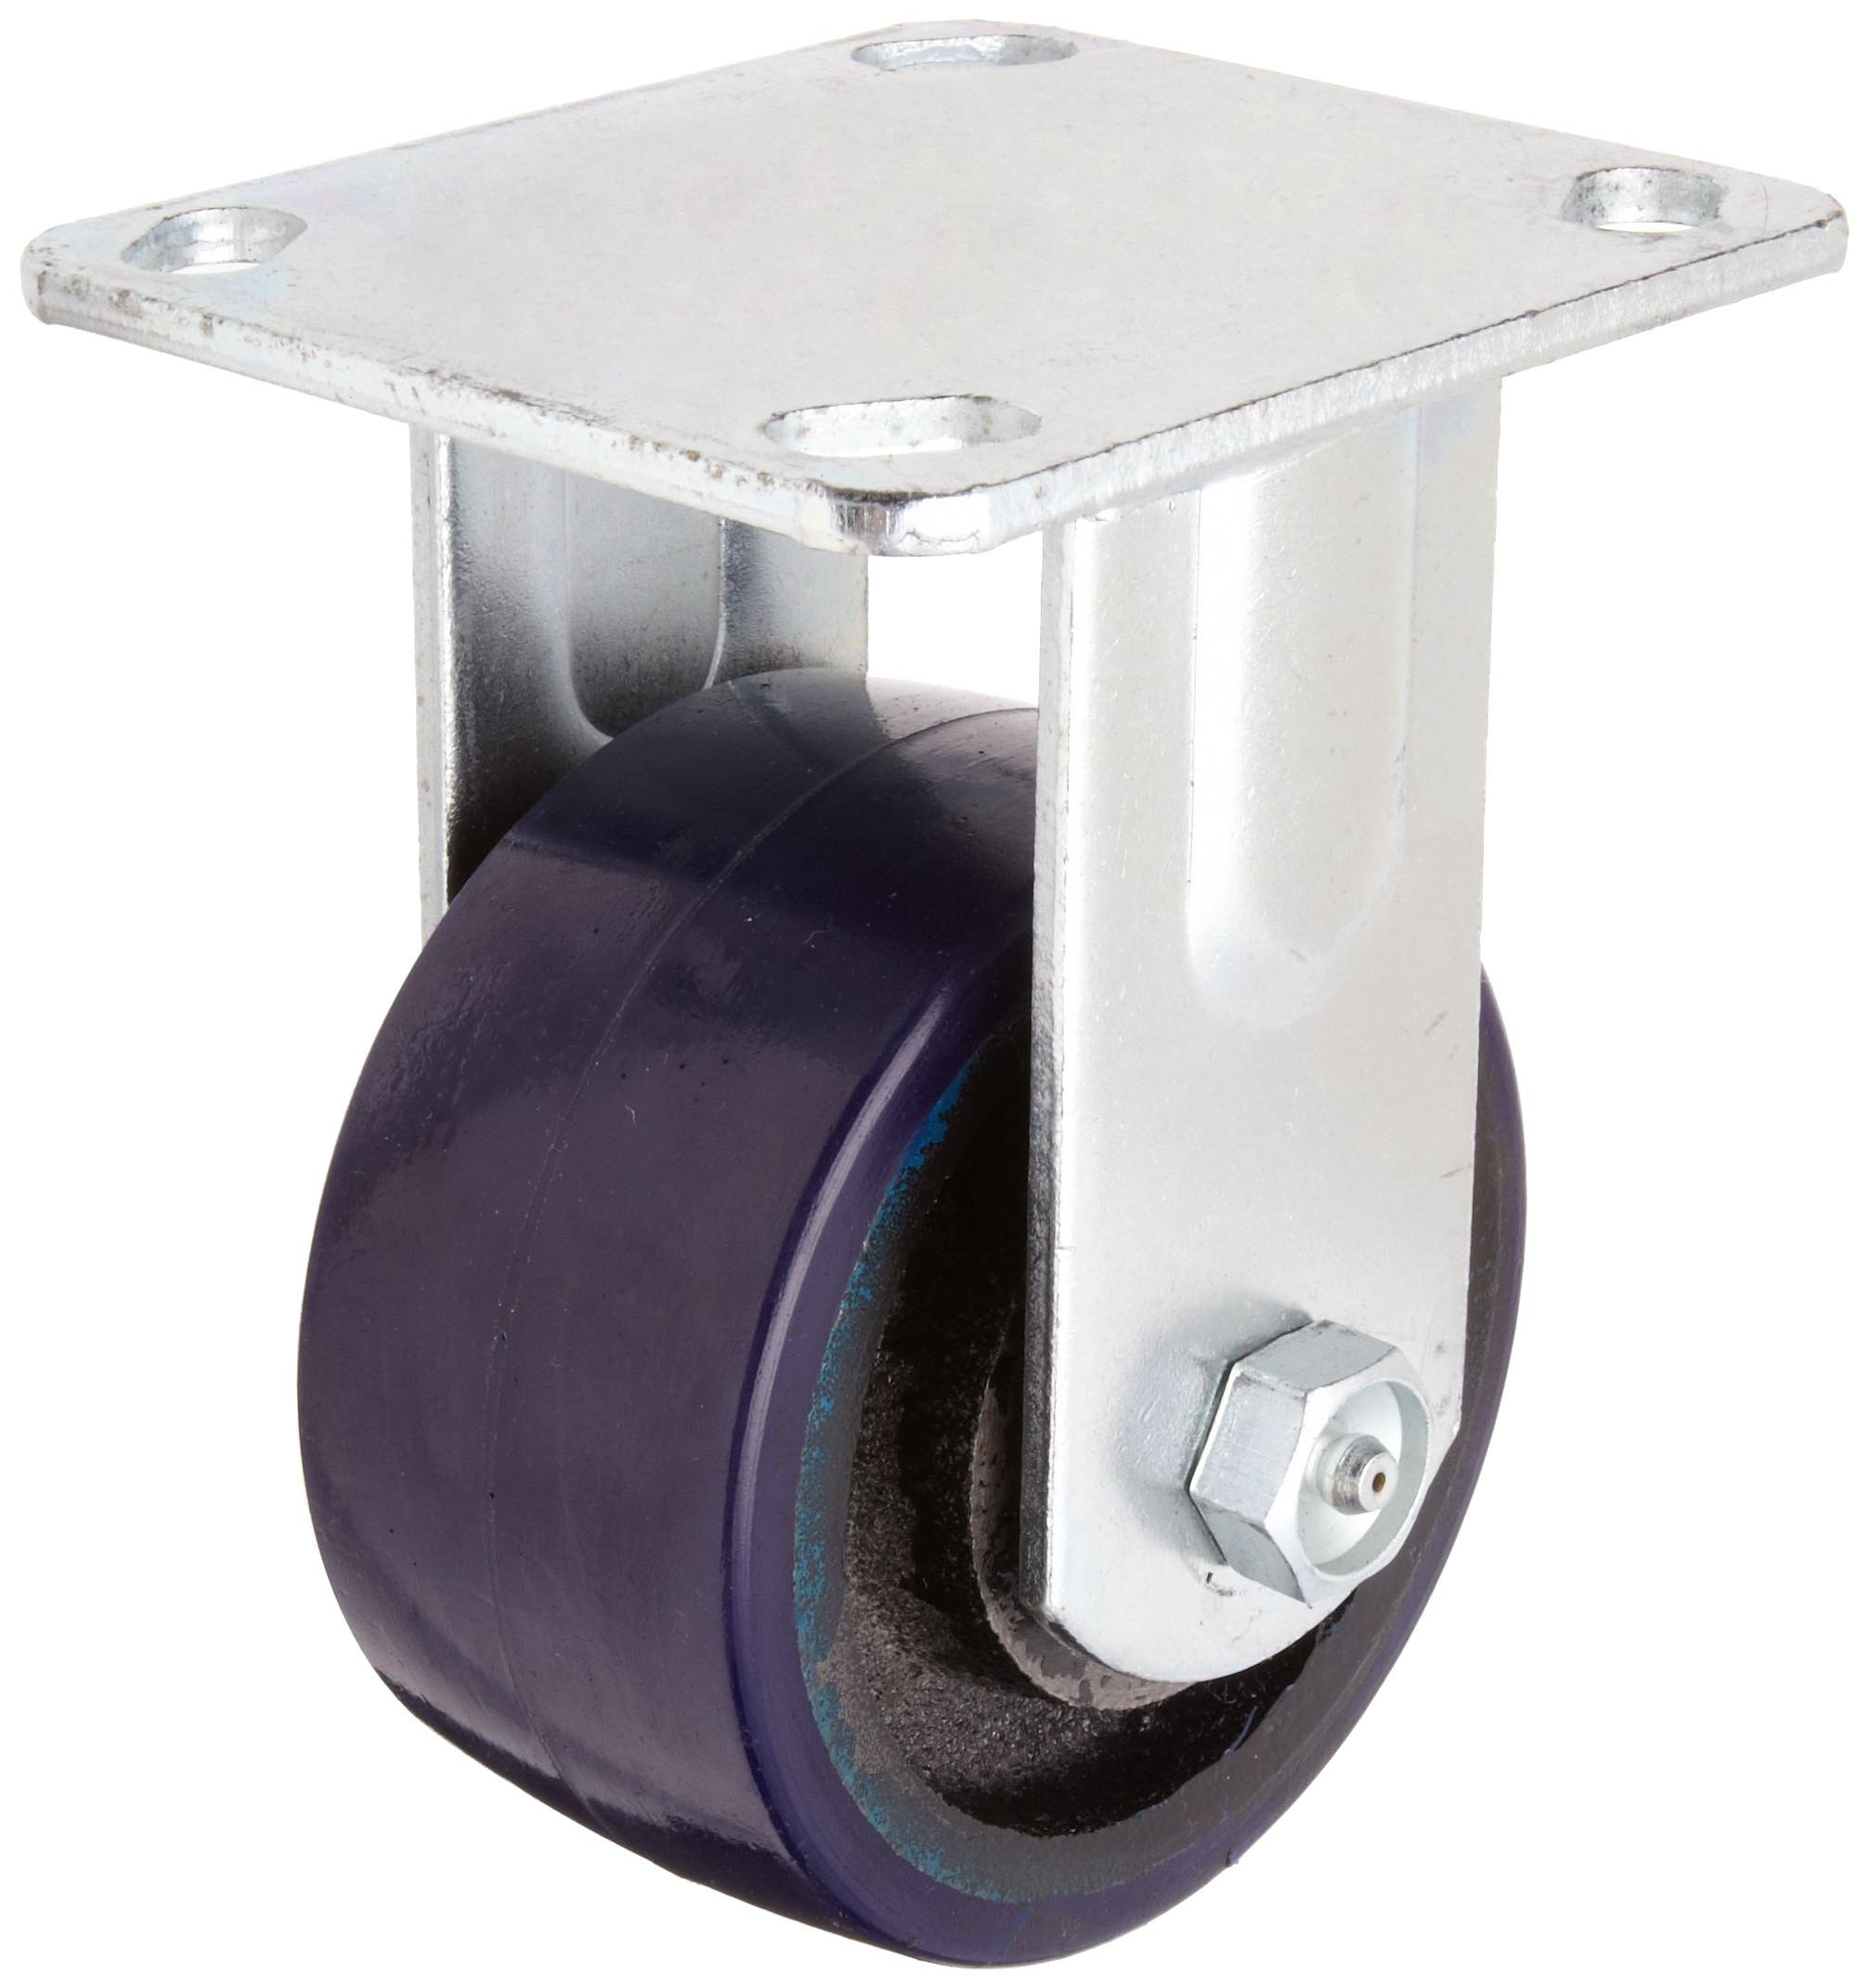 RWM Casters Freedom 48 Series Plate Caster, Rigid, Urethane on Aluminum Wheel, Roller Bearing, 700 lbs Capacity, 4'' Wheel Dia, 2'' Wheel Width, 5-5/8'' Mount Height, 4-1/2'' Plate Length, 4'' Plate Width